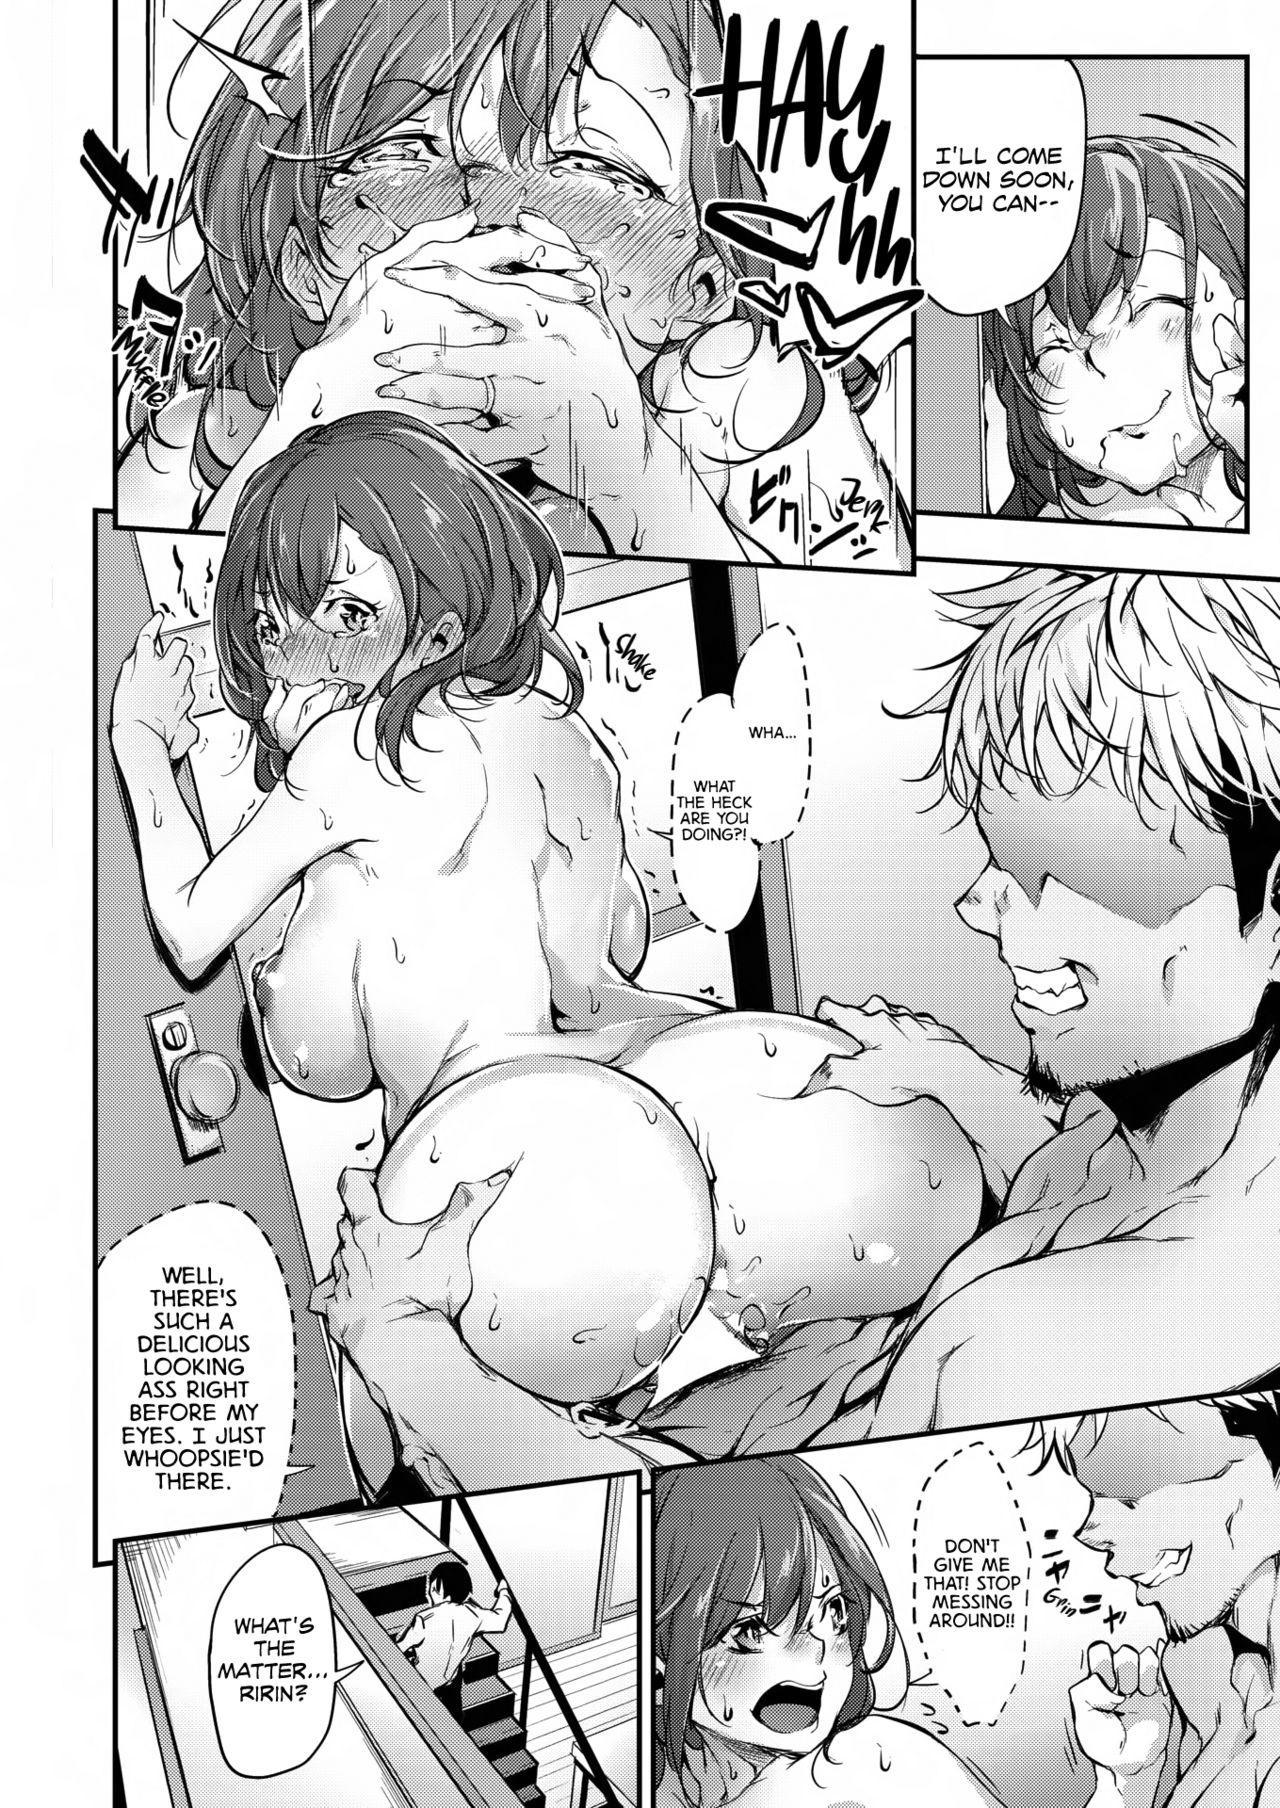 [Rokuichi] Ririn-san no Naisho no Kao to Daiji na Oheya | Ririn-san's Secret Expression and Her Precious Room (COMIC HOTMILK 2018-07) [English] [Stupid Beast] [Digital] 13